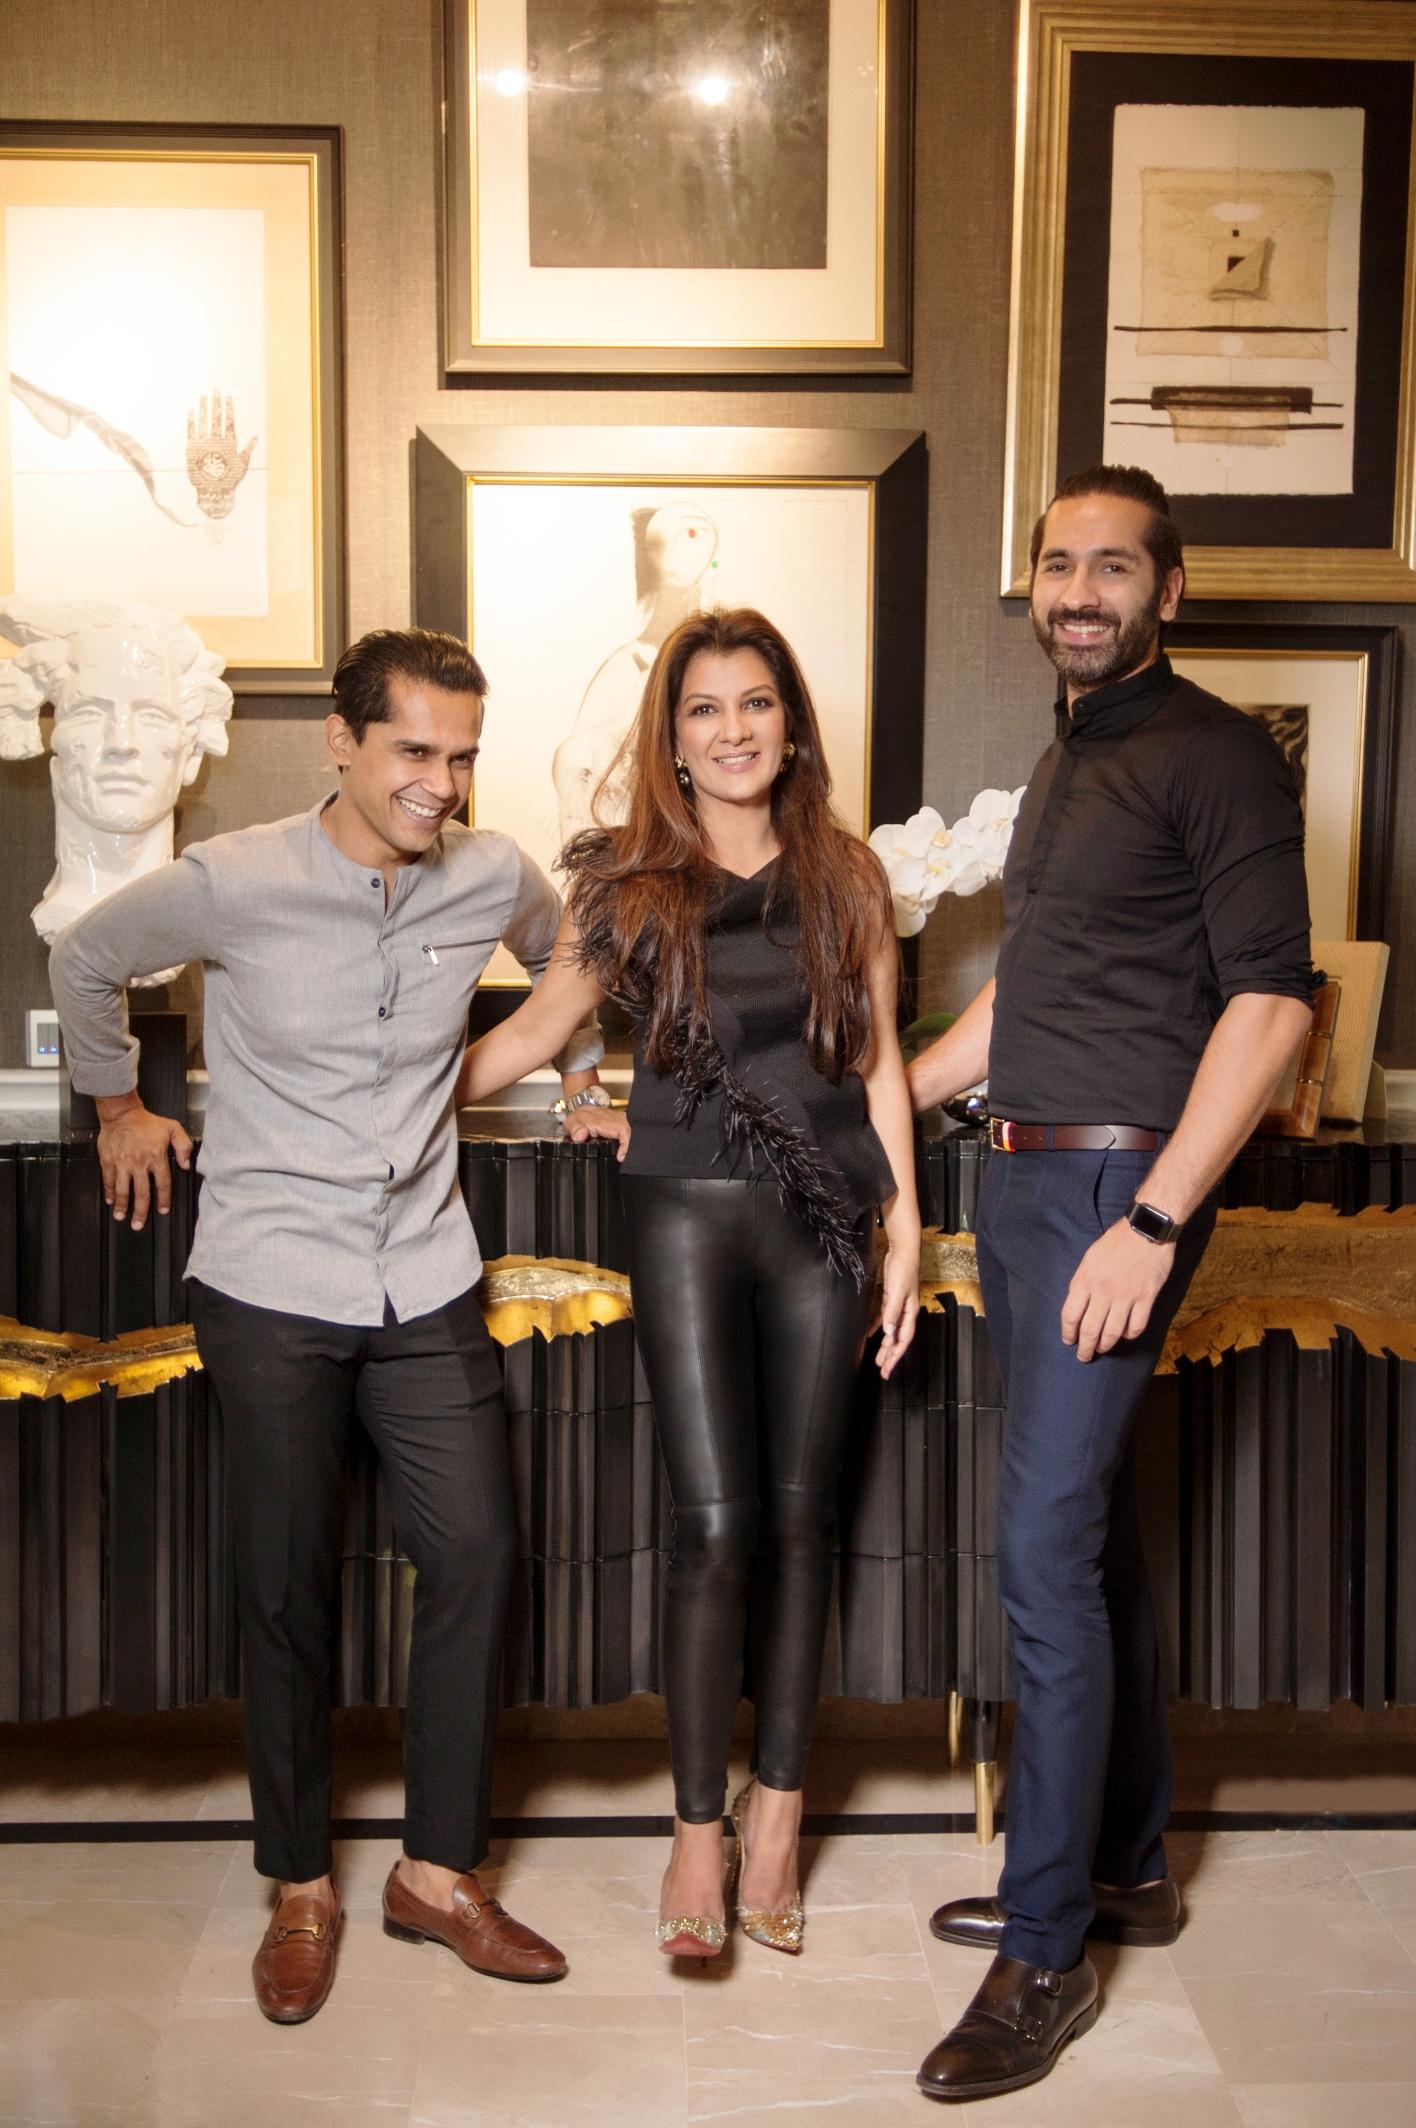 Team YOCA - Ahsan Najmi, Sarah Najmi Bilgrami and Zayd Bilgrami [F]